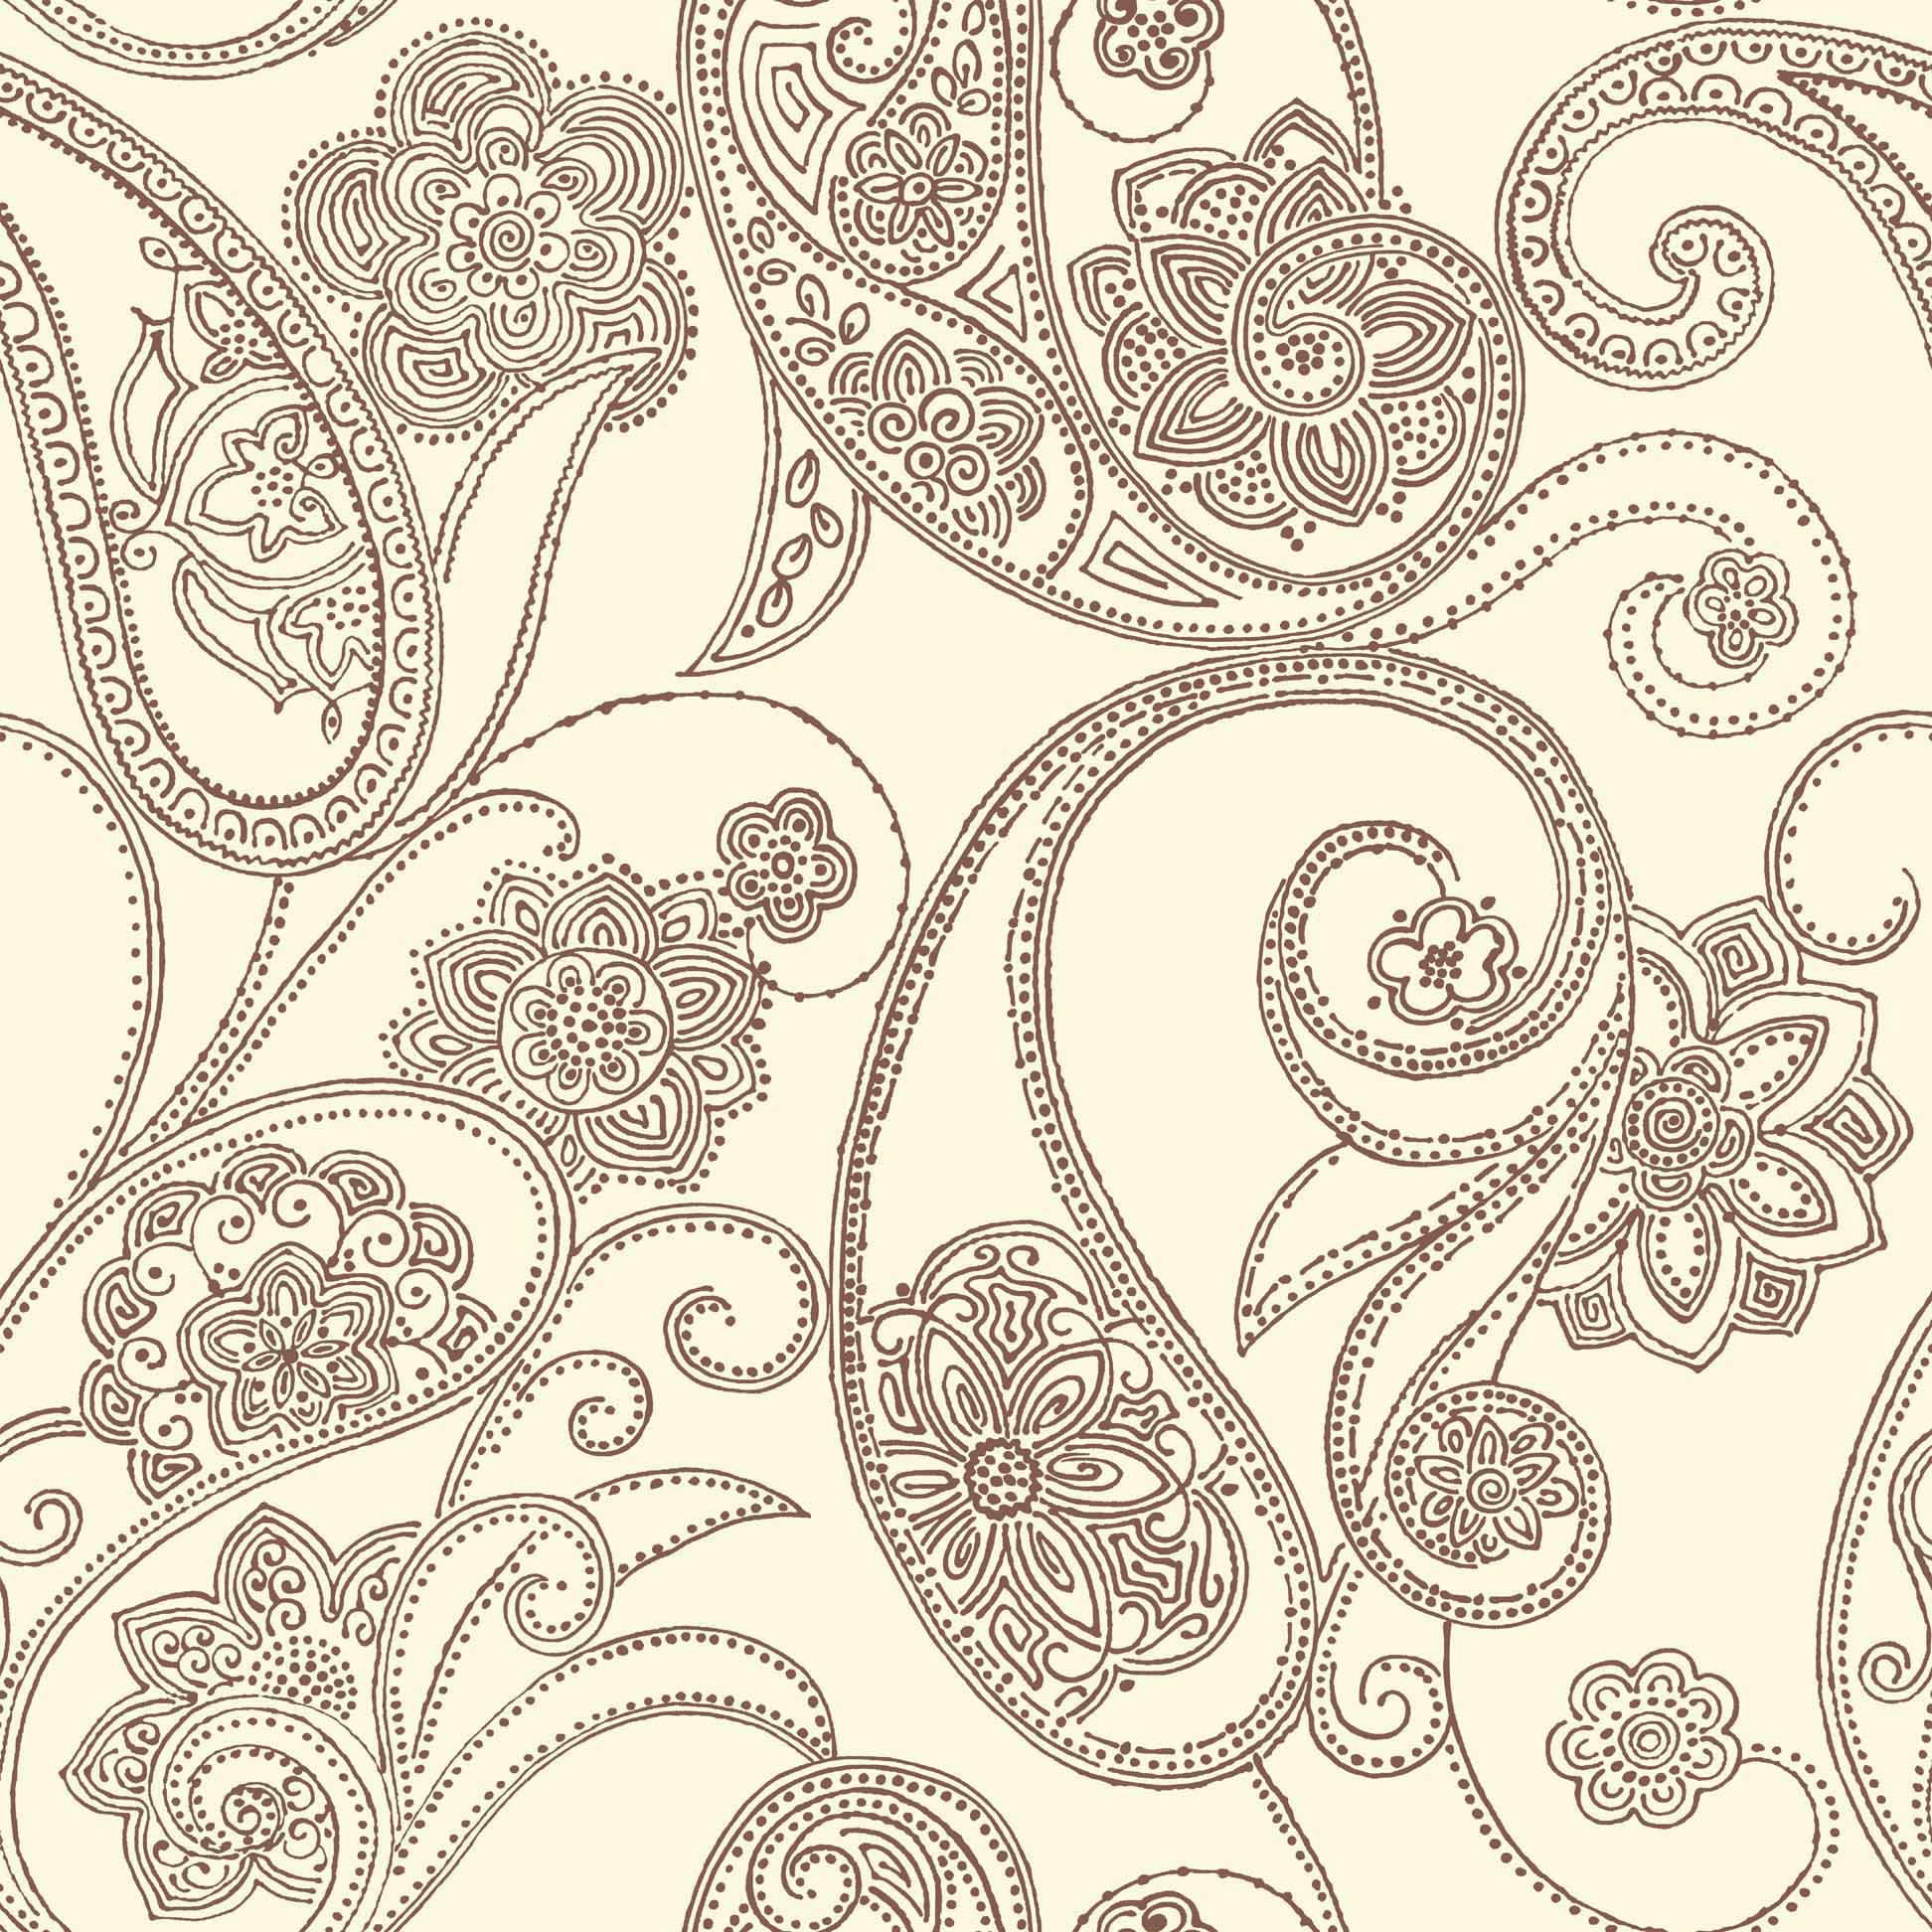 Images Paisley Franco Feruci Luxury Wallpapers Dotted Paisley Yaz 97087 Designer Paisley Wallpaper Discount Wallpaper Modern Wallpaper Designs